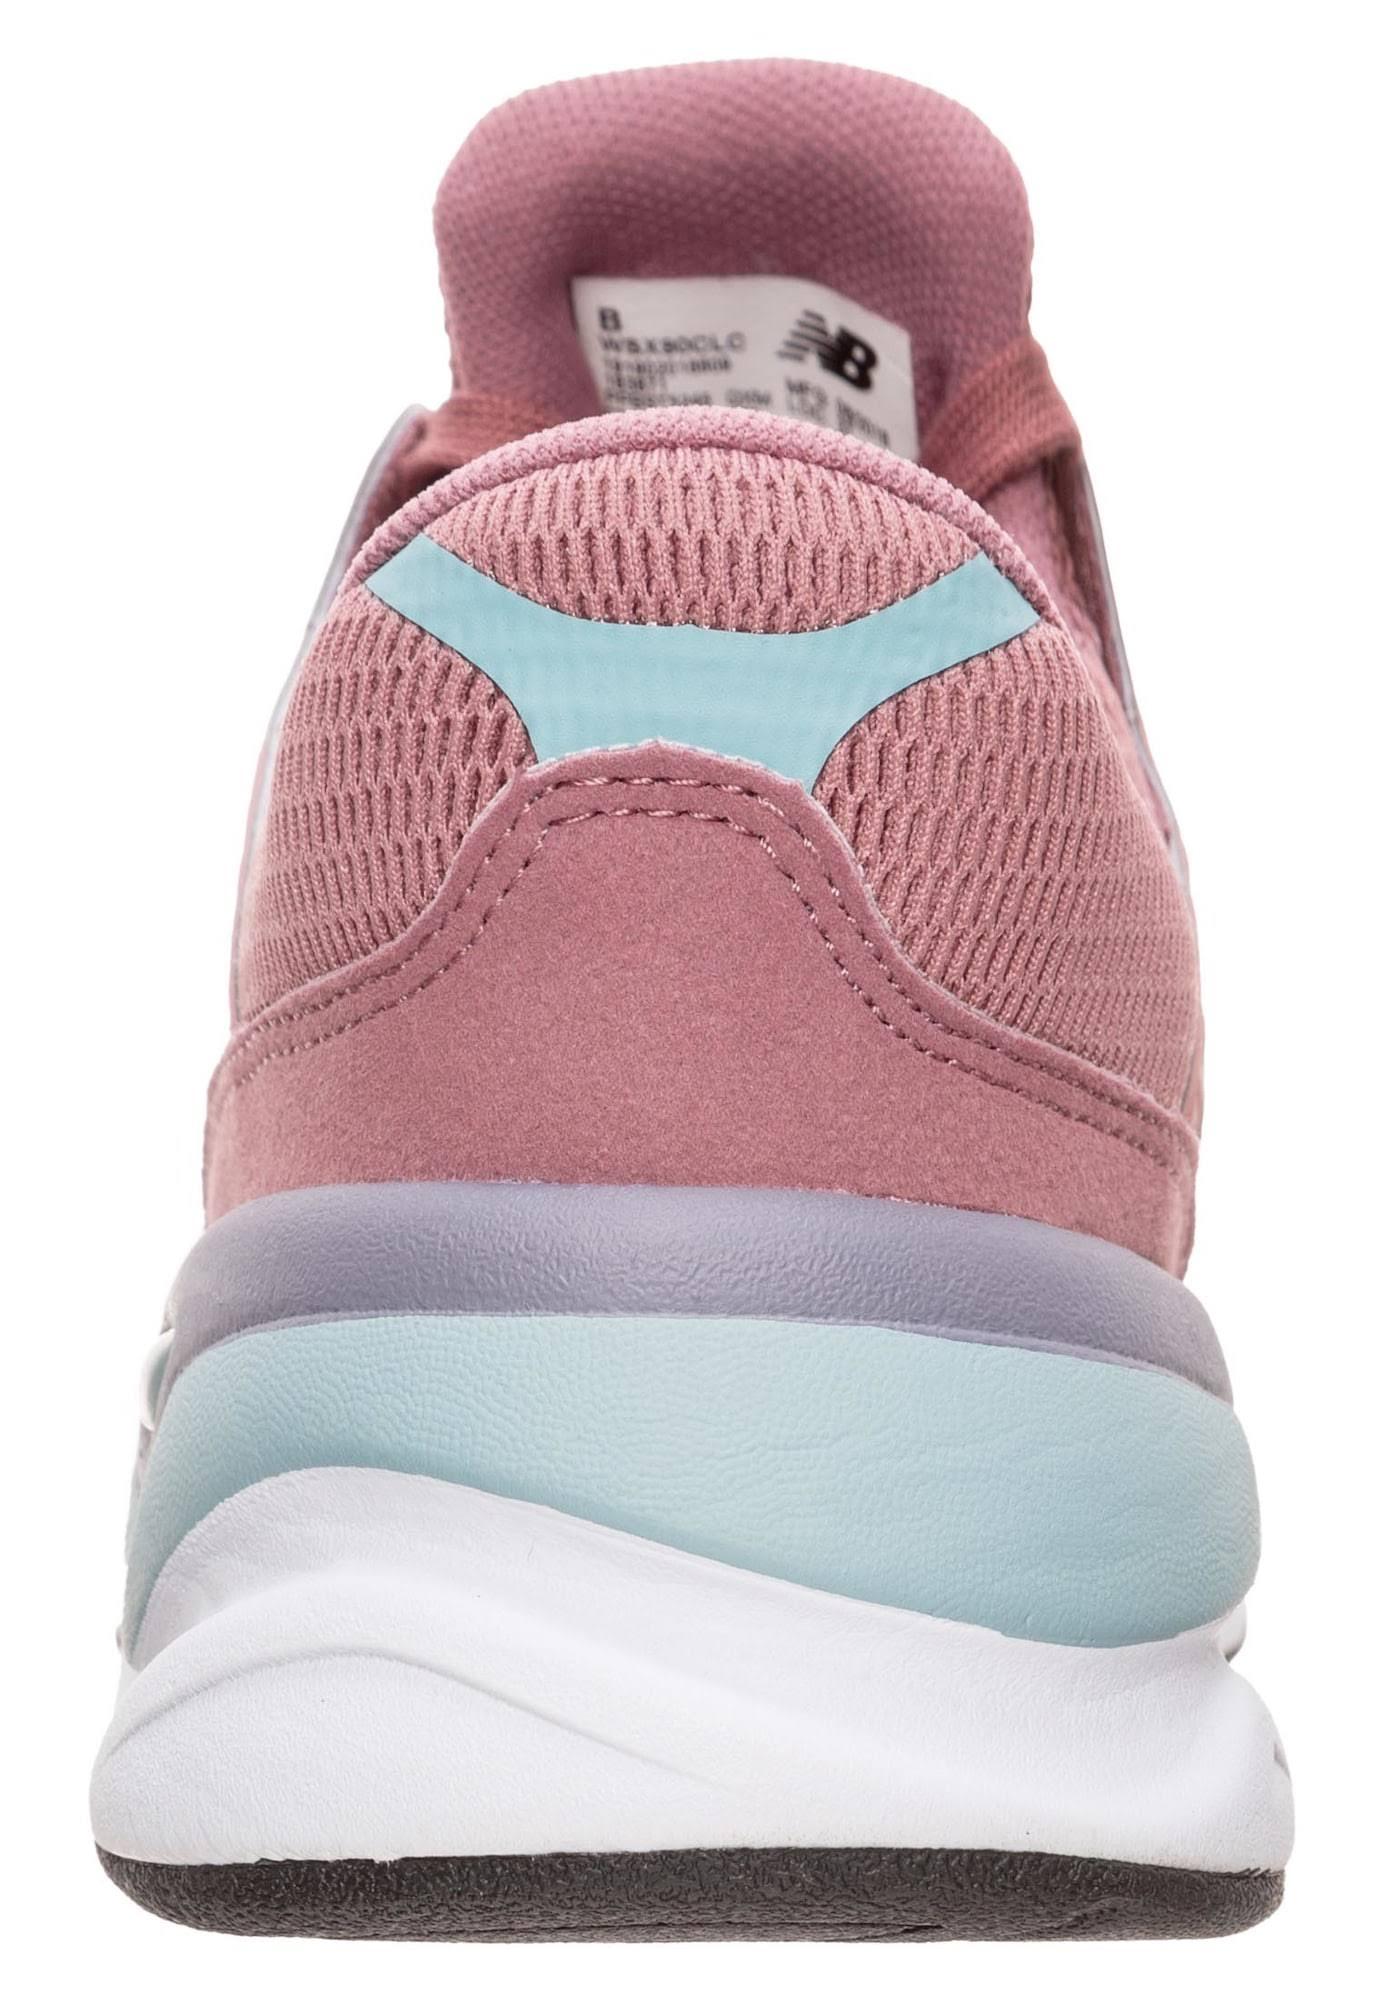 Damen clc b Pink Sneaker Balance New Wsx90 D9Y2EIeWHb